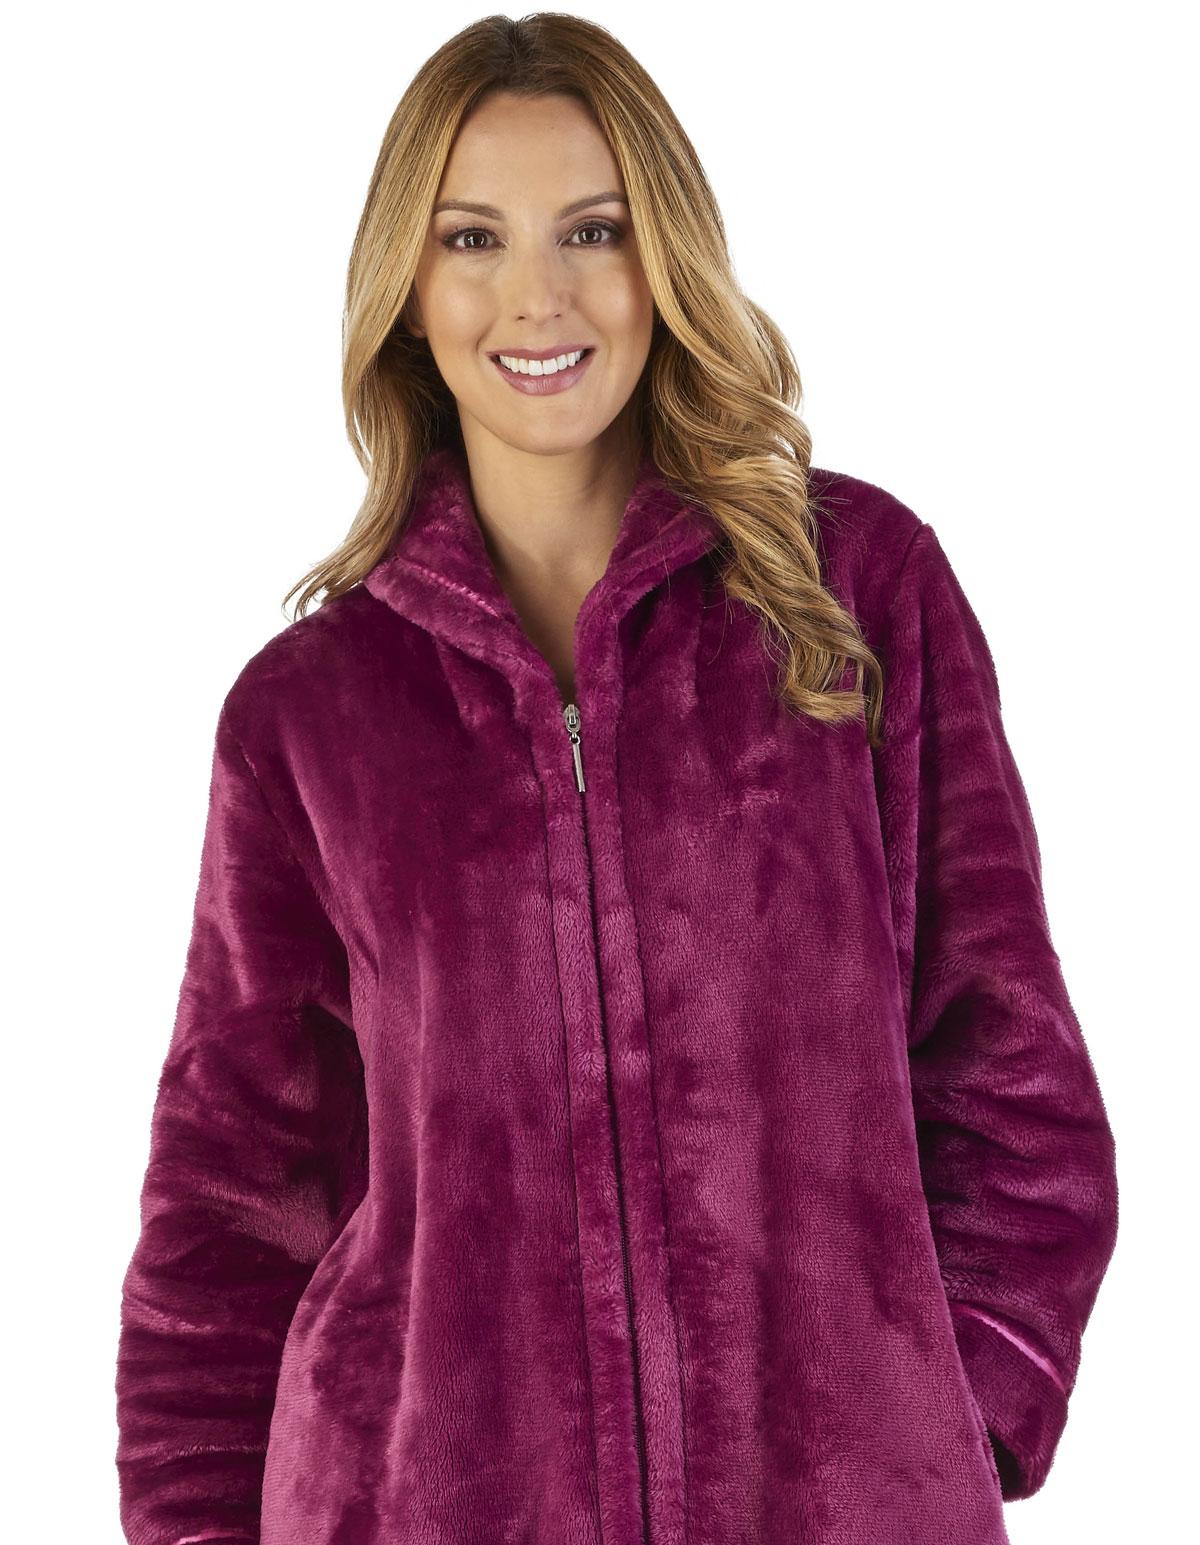 Slenderella HC2345 Luxury Fleece Dressing Gown